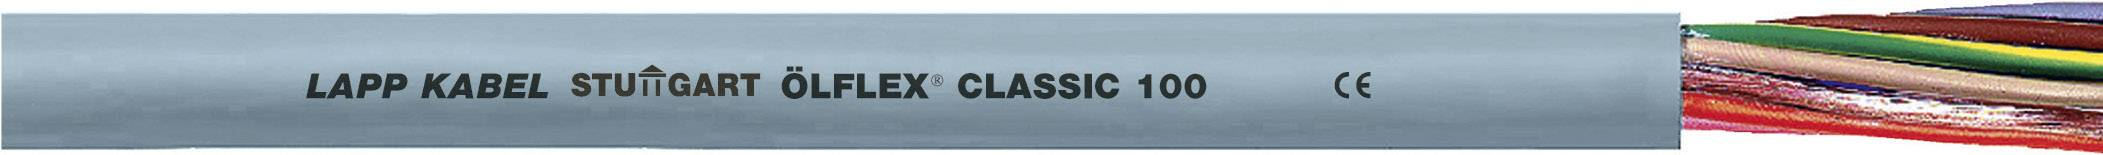 Kabel LappKabel Ölflex CLASSIC 100 2X1,5 (00100634), PVC, 6,3 mm, 500 V, šedá, 300 m